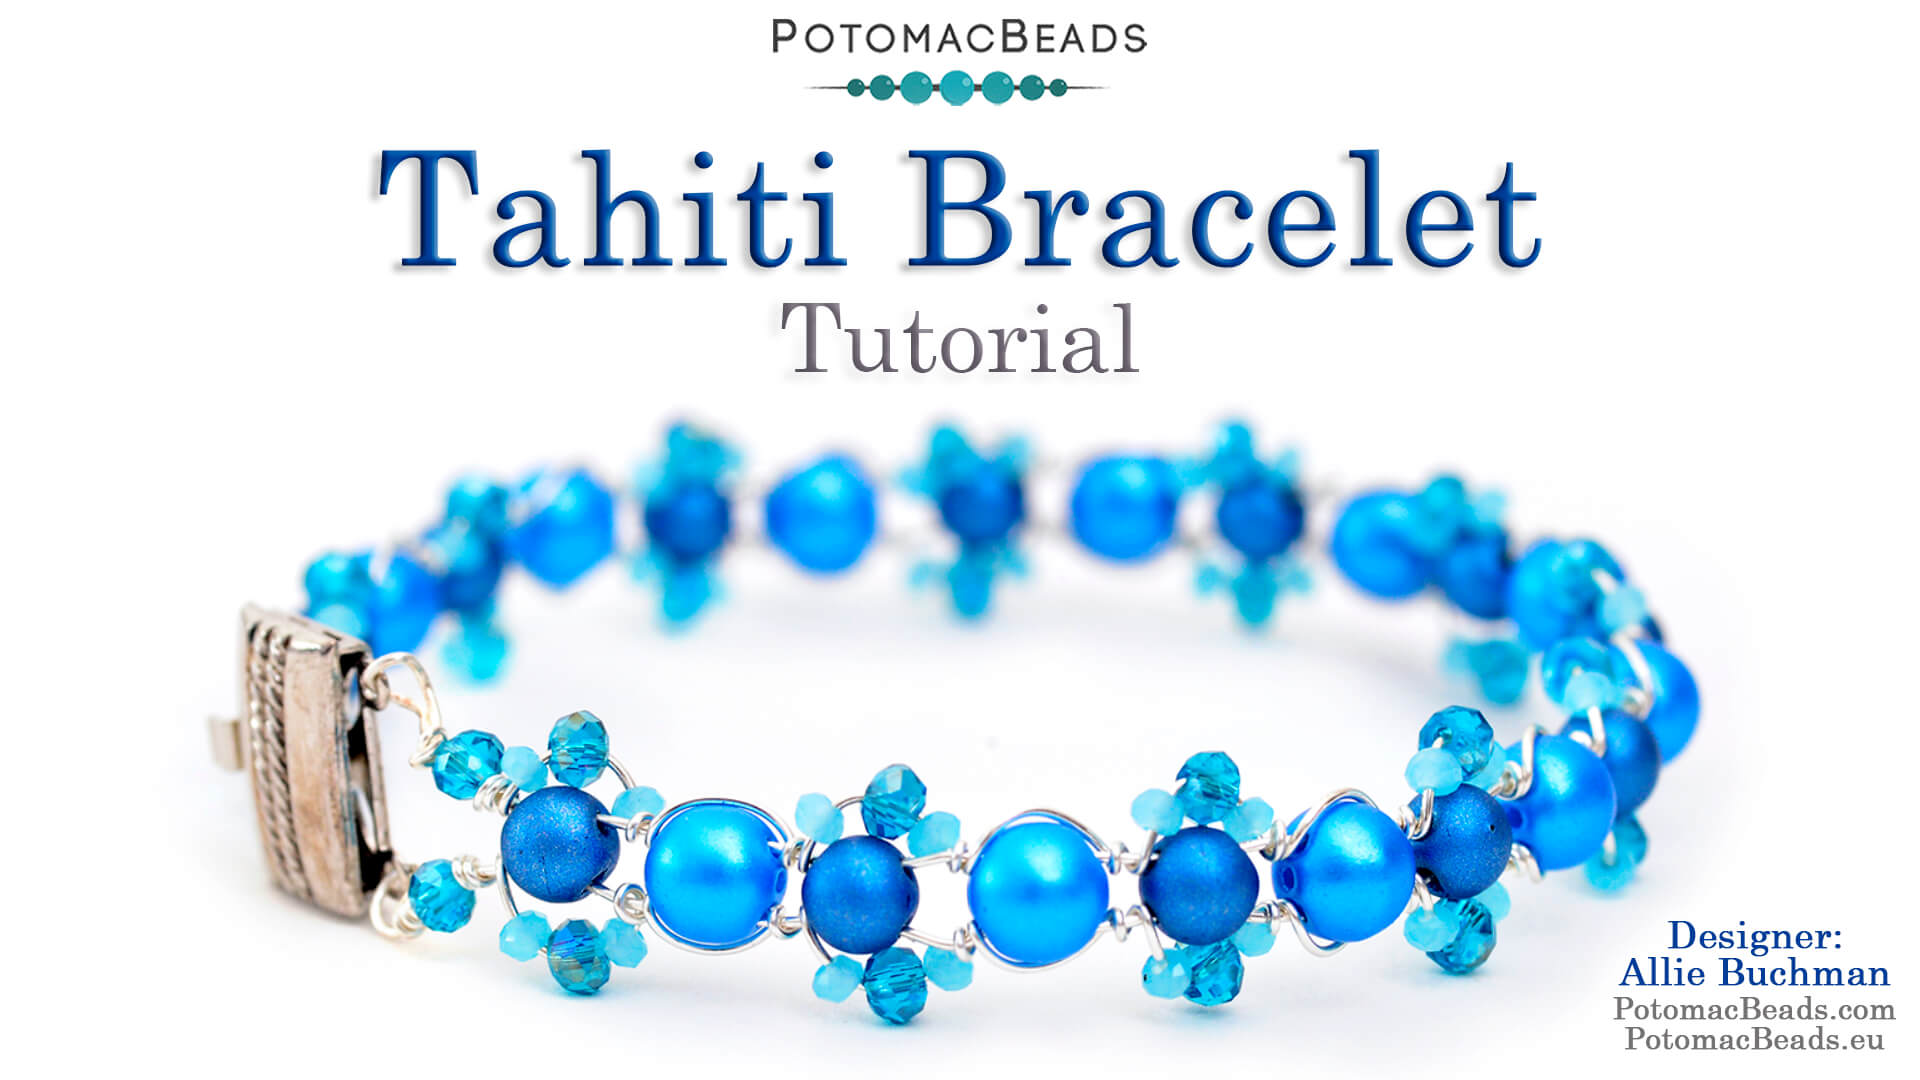 How to Bead Jewelry / Videos Sorted by Beads / RounTrio® & RounTrio® Faceted Bead Videos / Tahiti Bracelet Tutorial